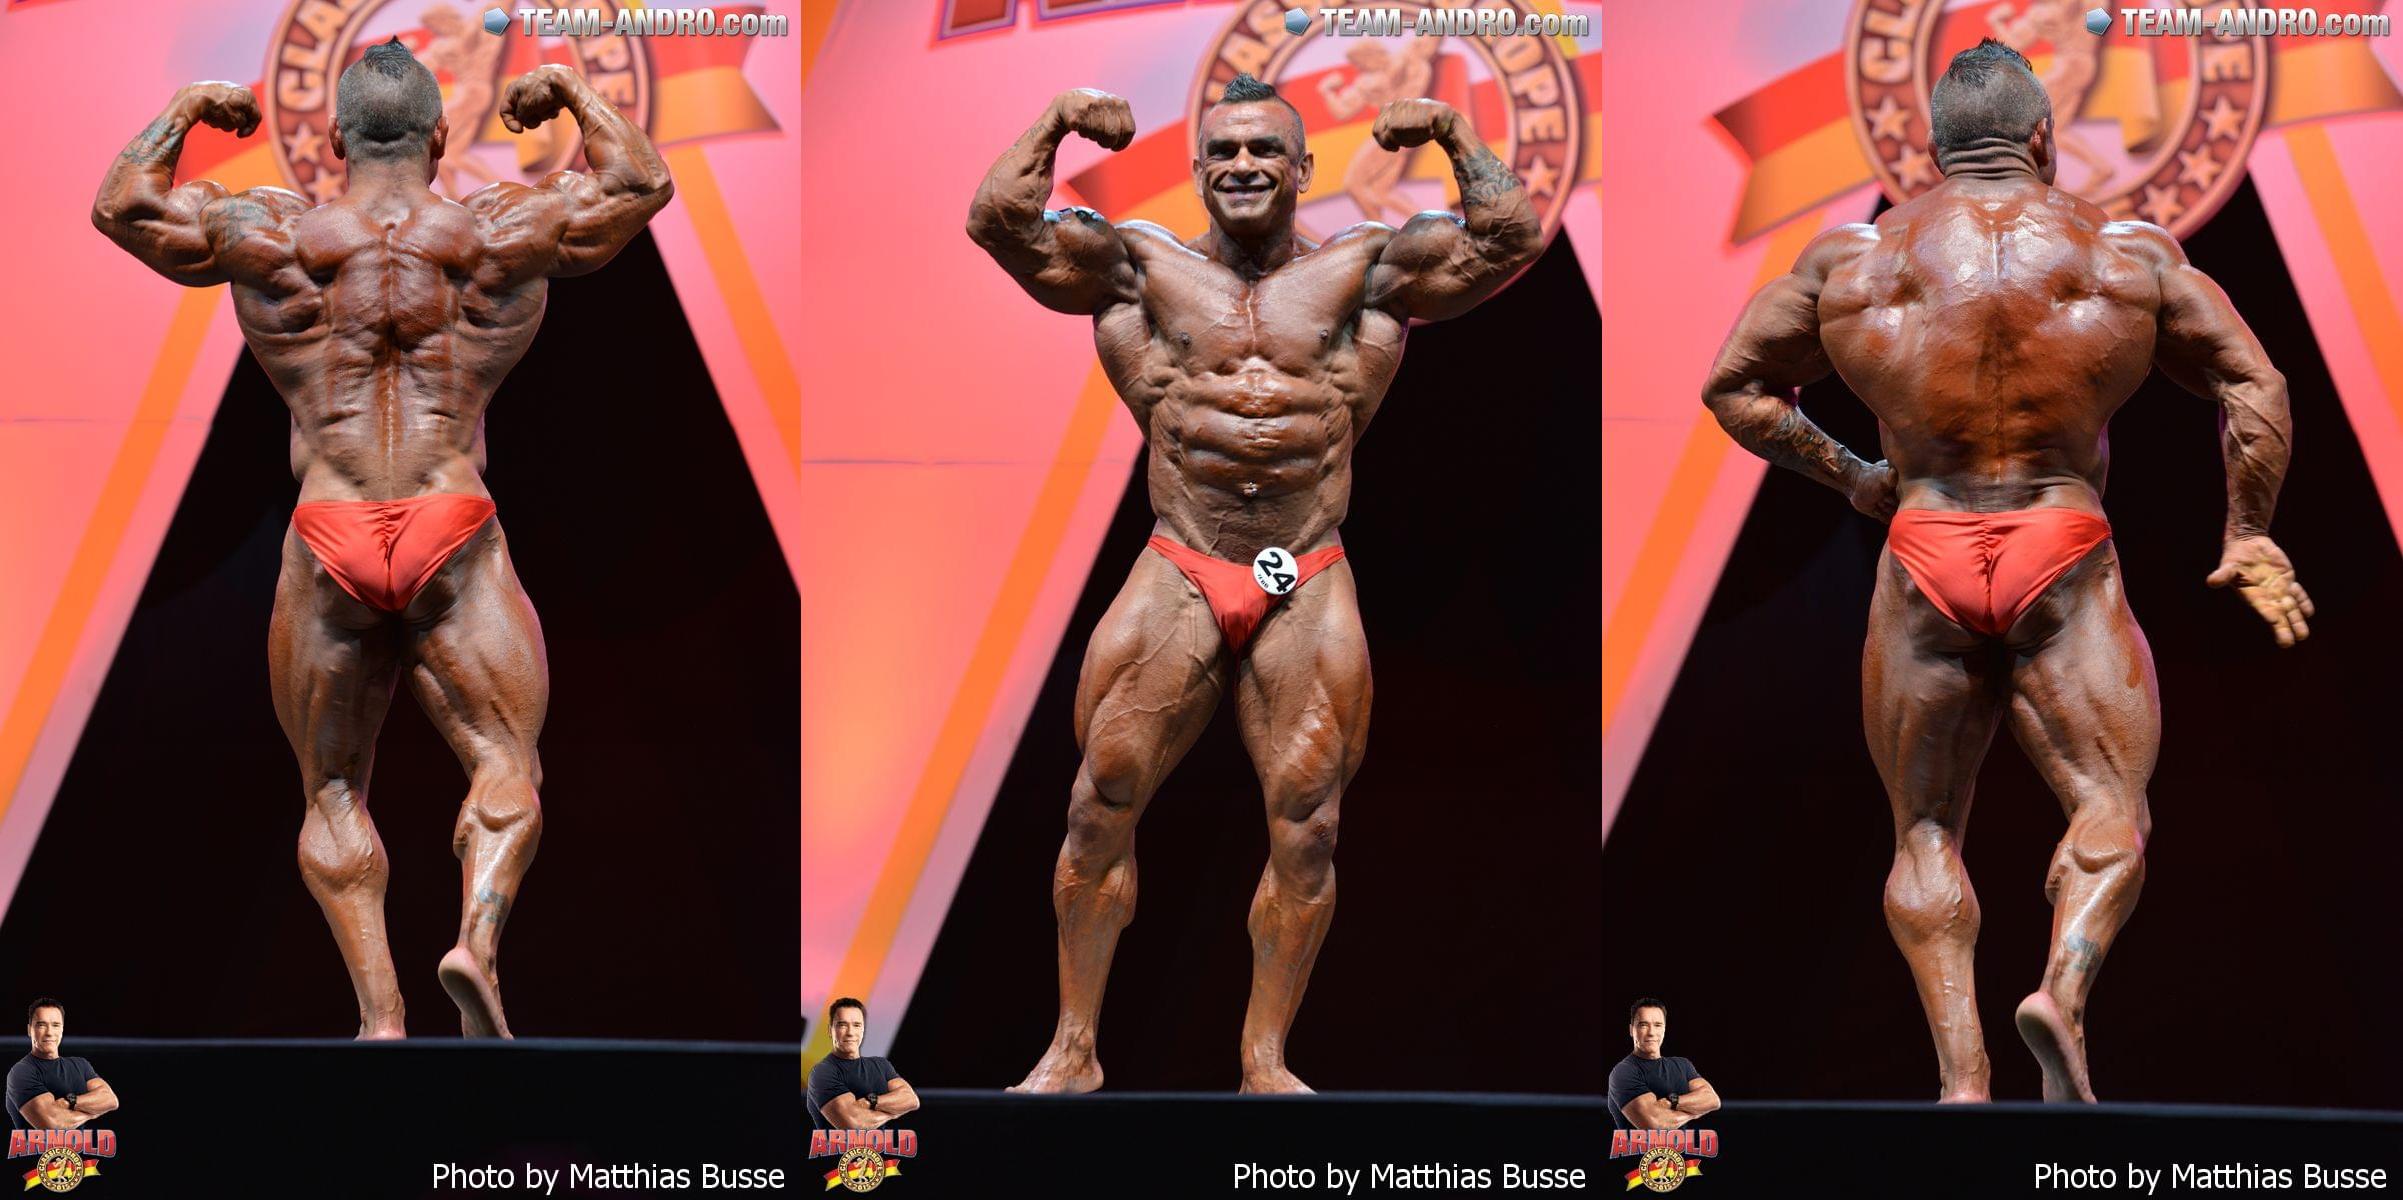 Carlos Ascensio (Spain) - 16 место